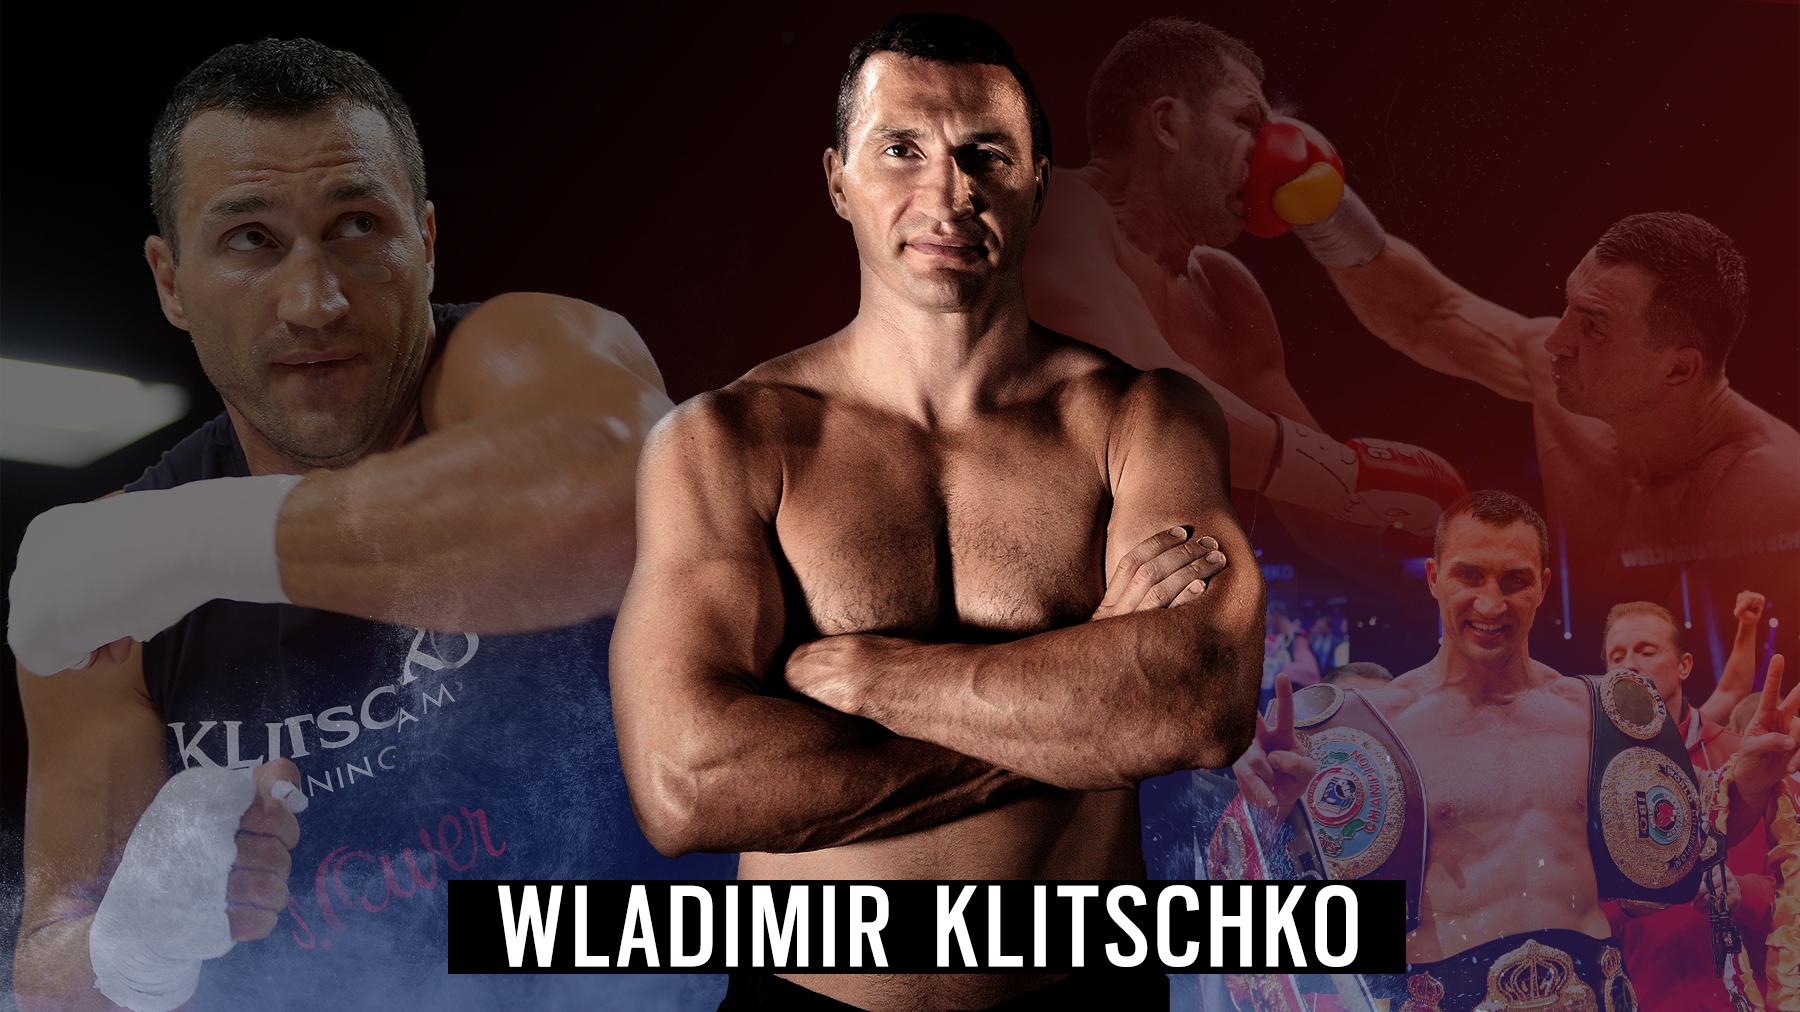 Wladimir Klitschko retires as the reigning gentleman champion of the heavyweights